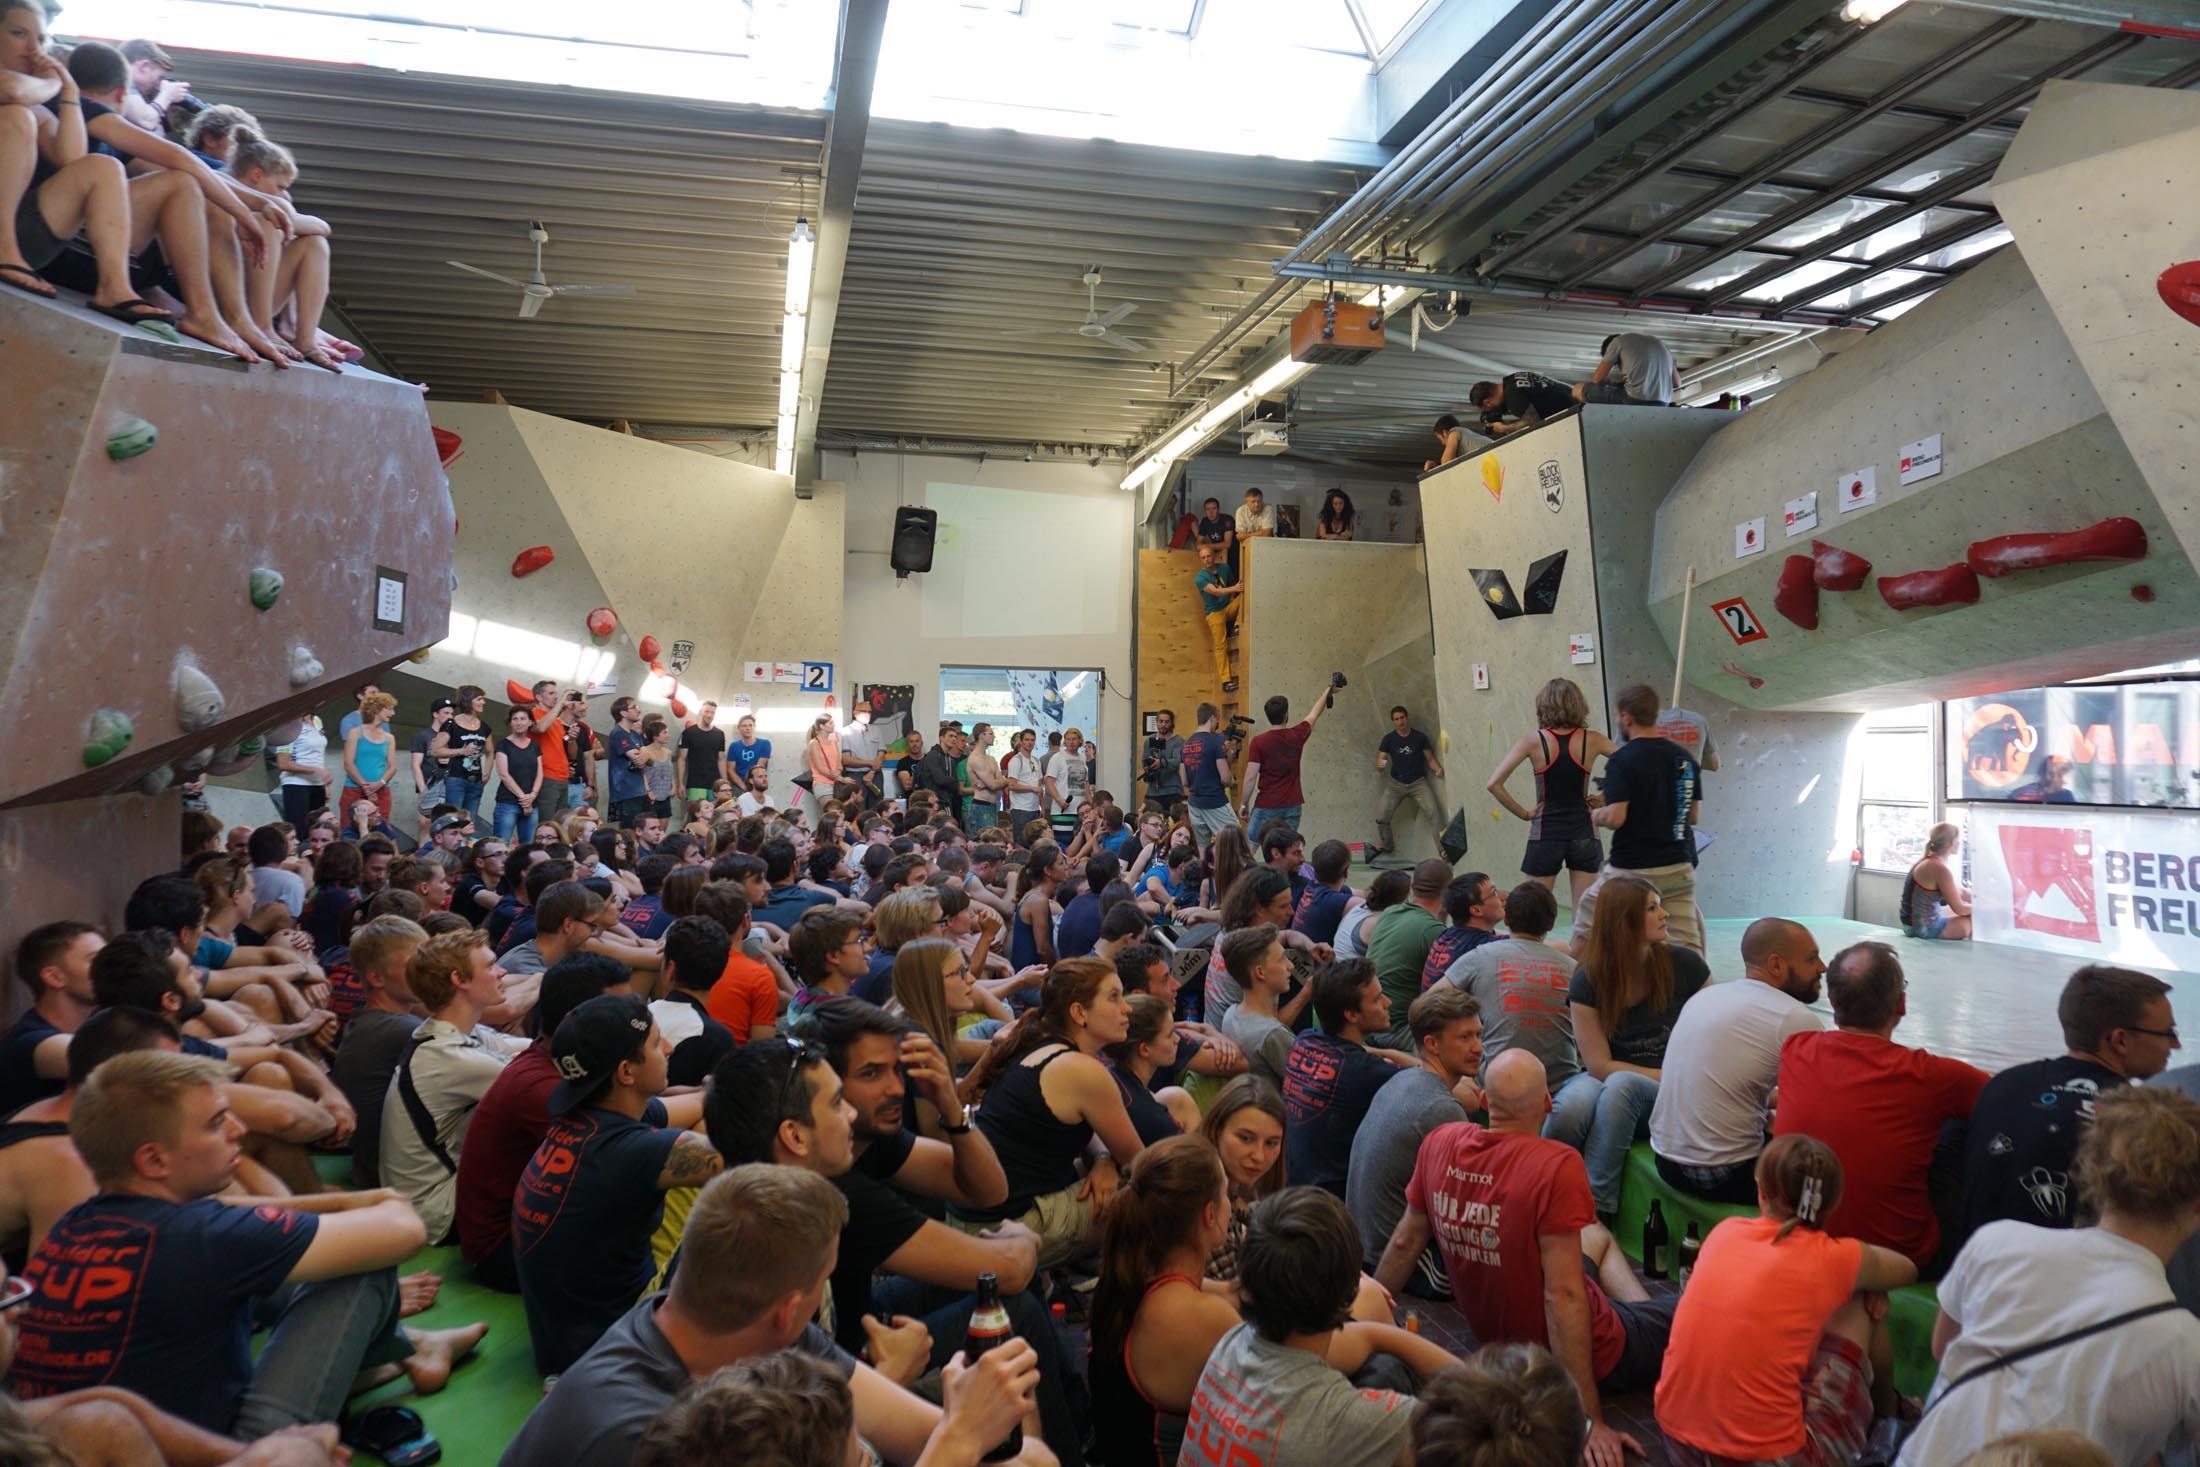 Finale, internationaler bouldercup Frankenjura 2016, BLOCKHELDEN Erlangen, Mammut, Bergfreunde.de, Boulderwettkampf07092016568